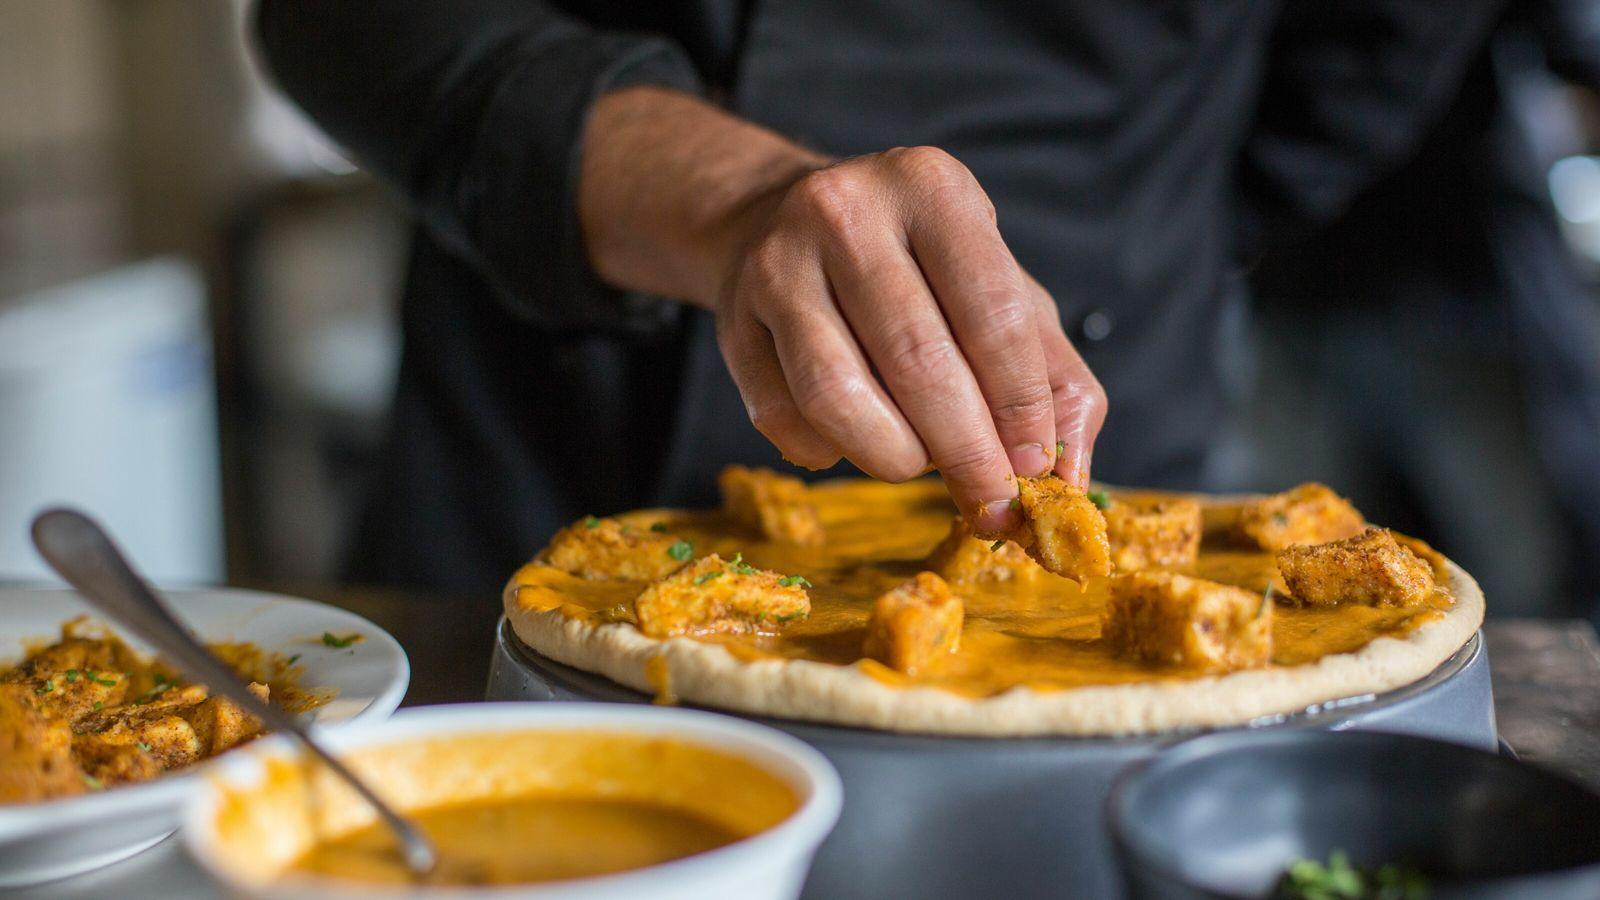 Vegan cheese pizza with tofu and house sauce at Carrots restaurant, Bengaluru.